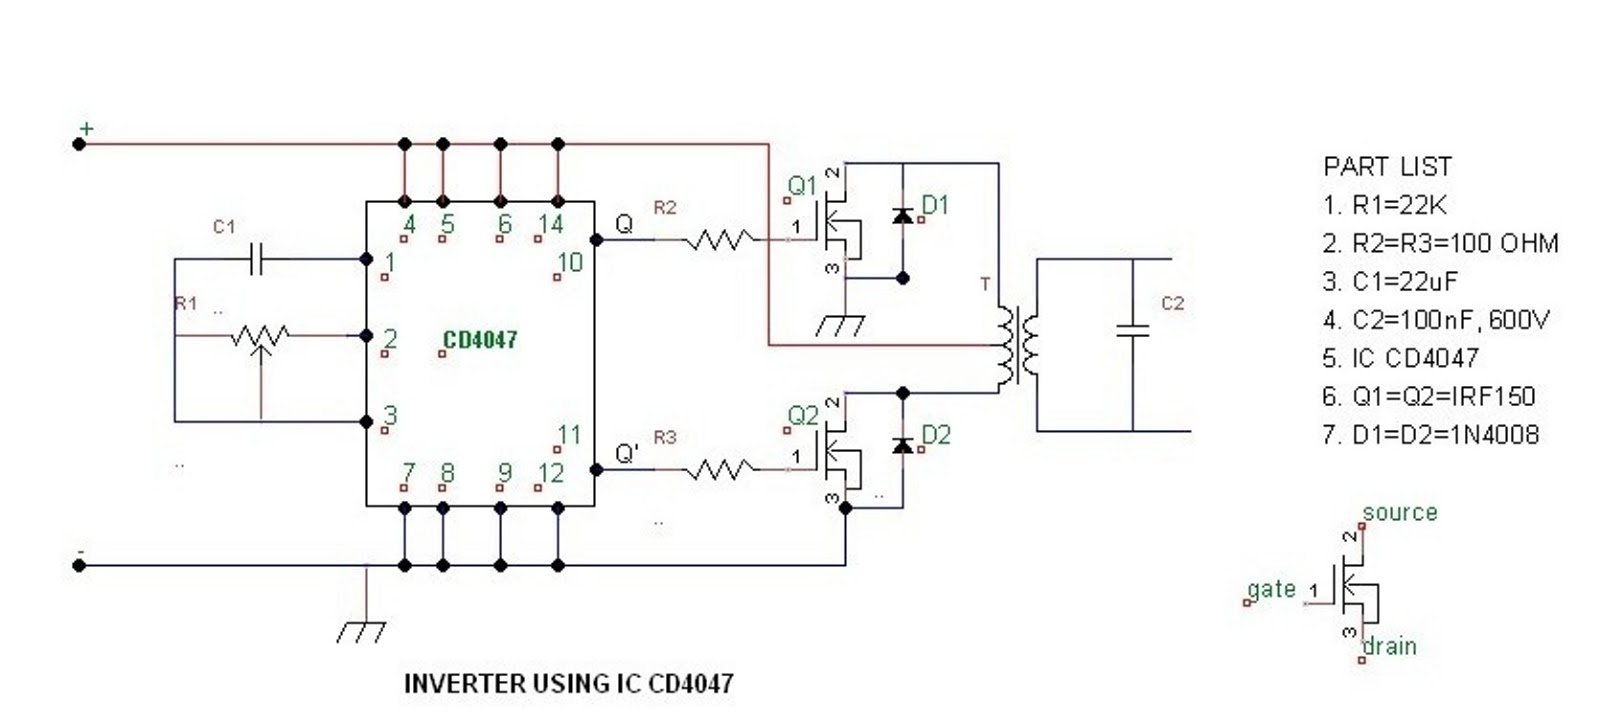 Step Up Transformer Wiring Diagrams Simple 100 Watt To 500 Watt Inverter Circuit